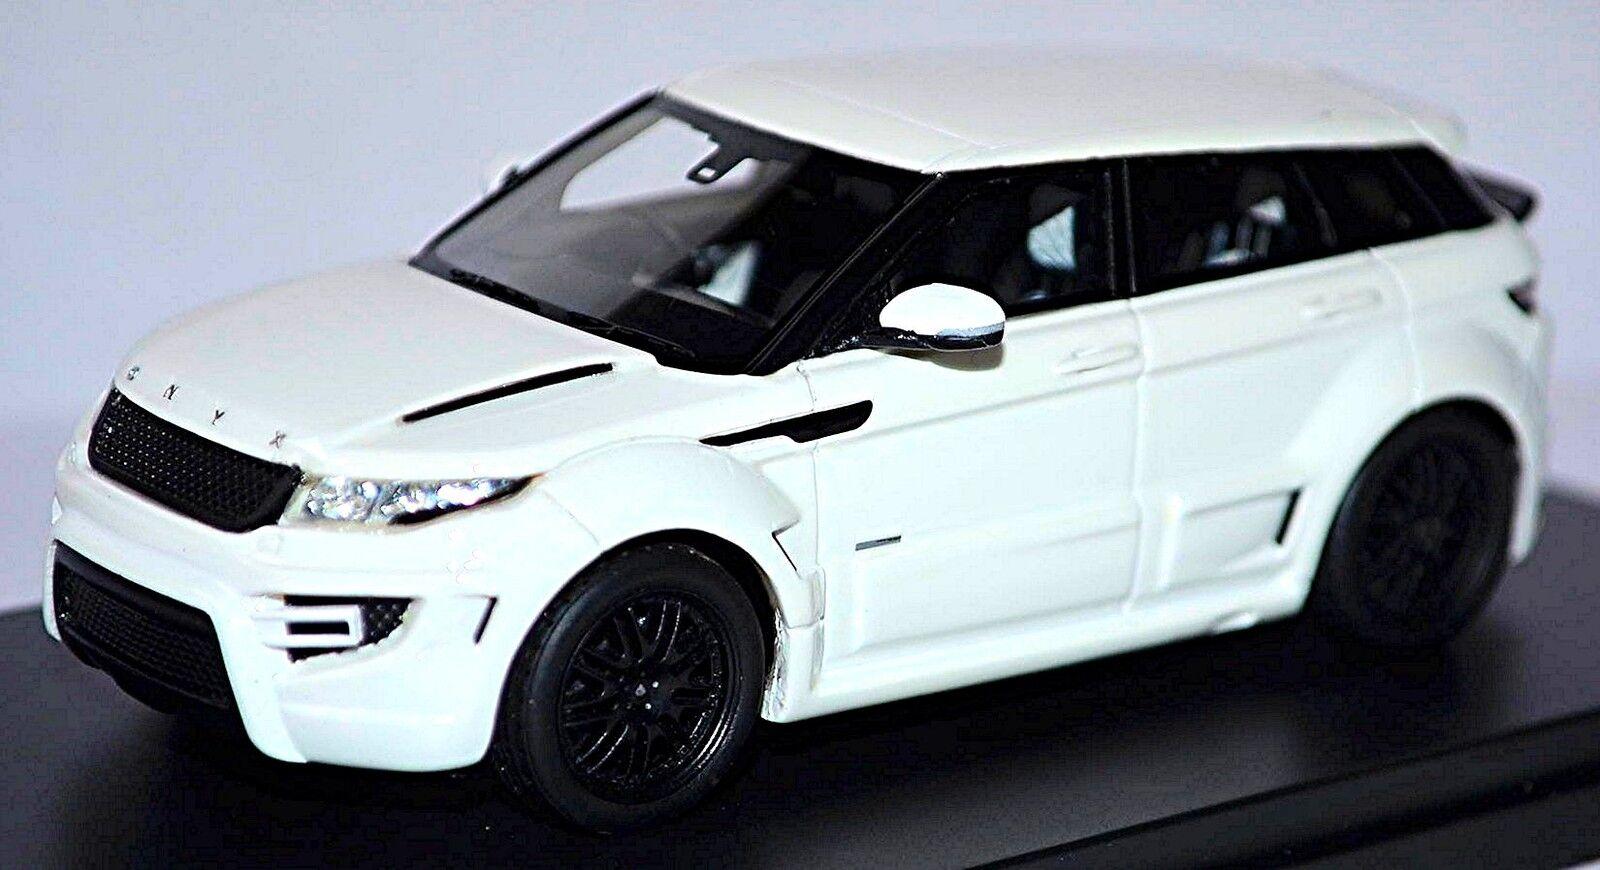 Range Rover Despertar Onyx Tuning 2012 whiteo whiteo 1 43